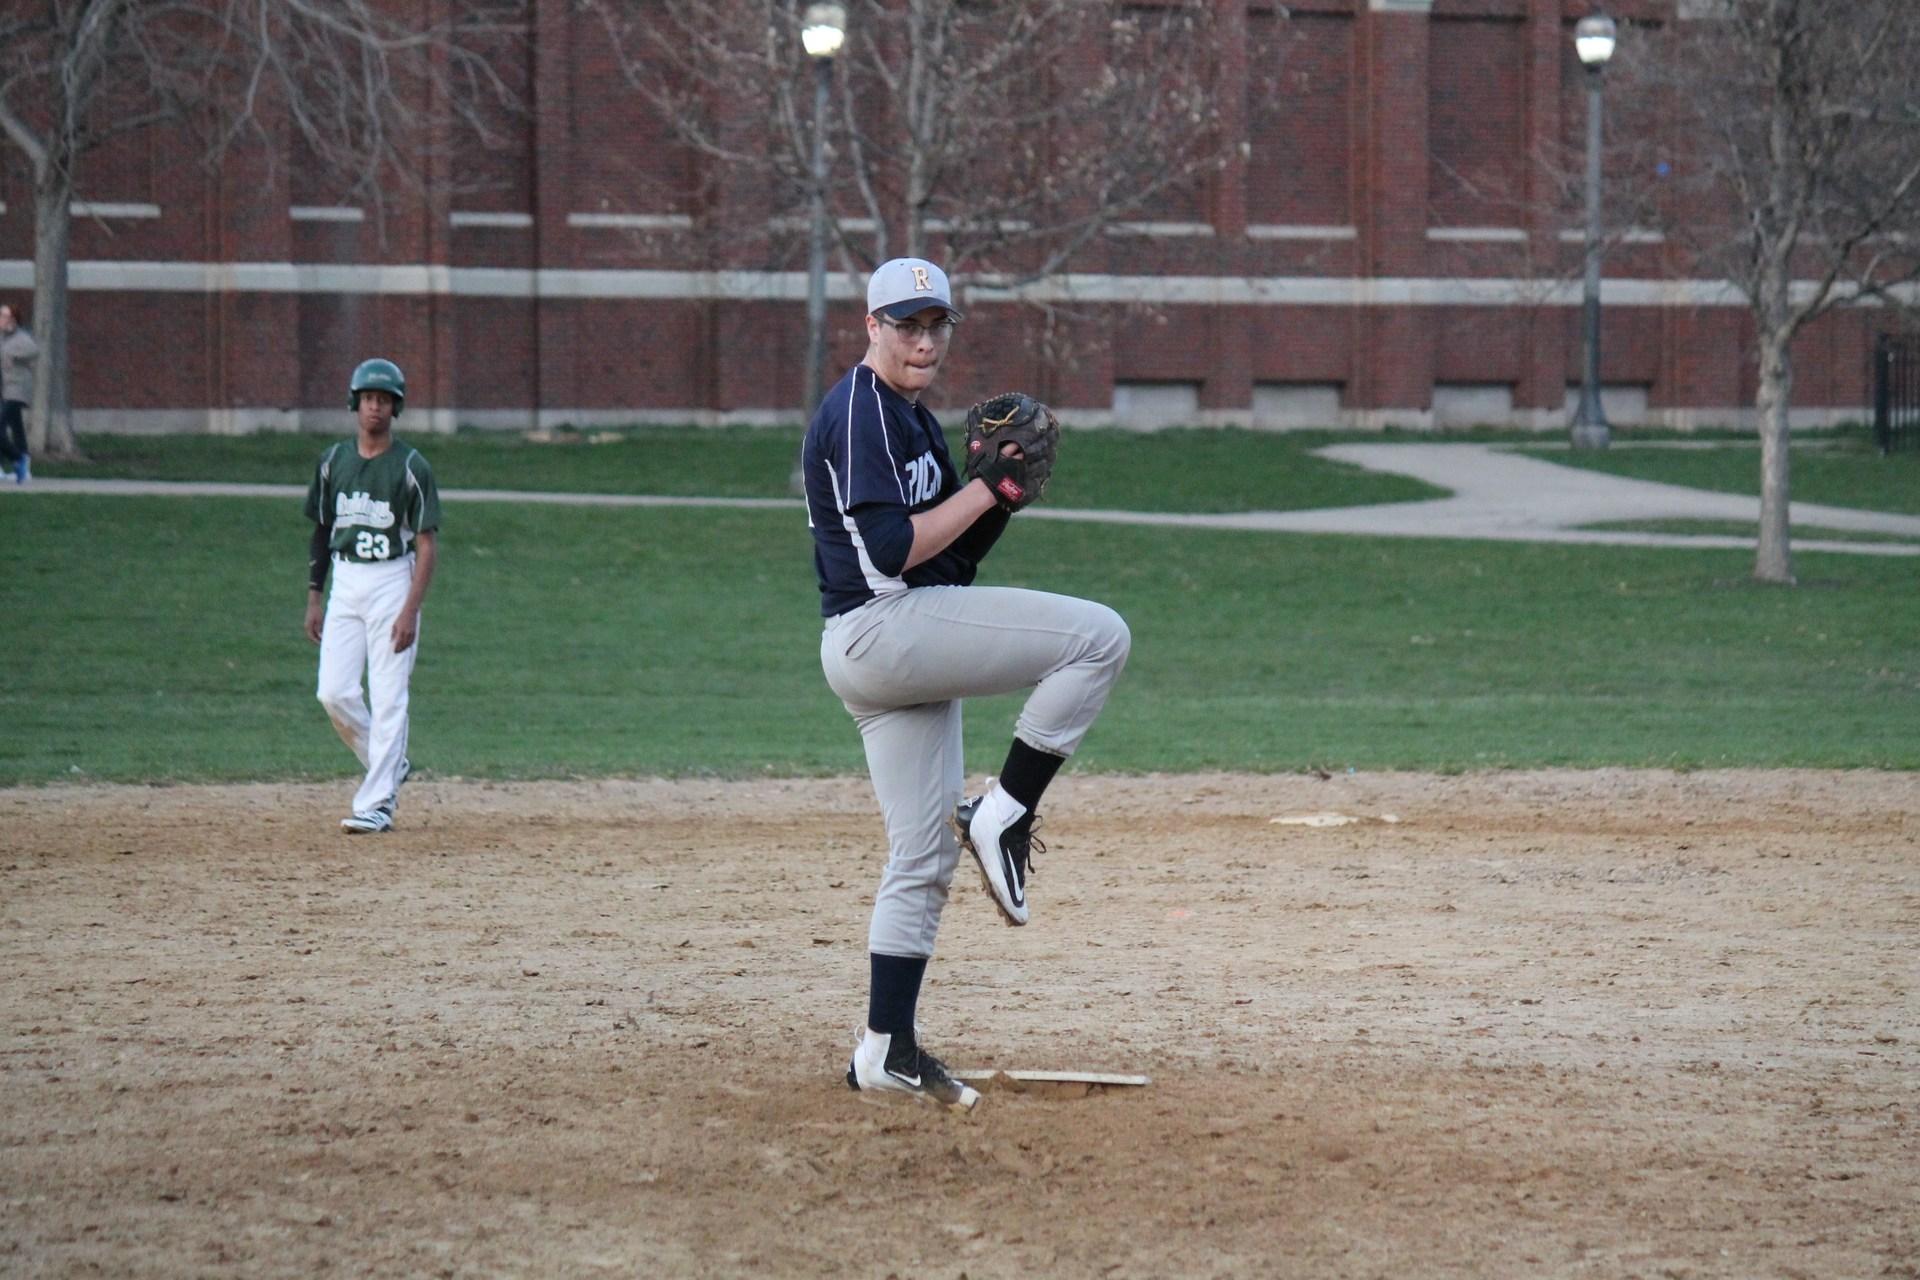 Rickover cadet preparing to pitch a baseball